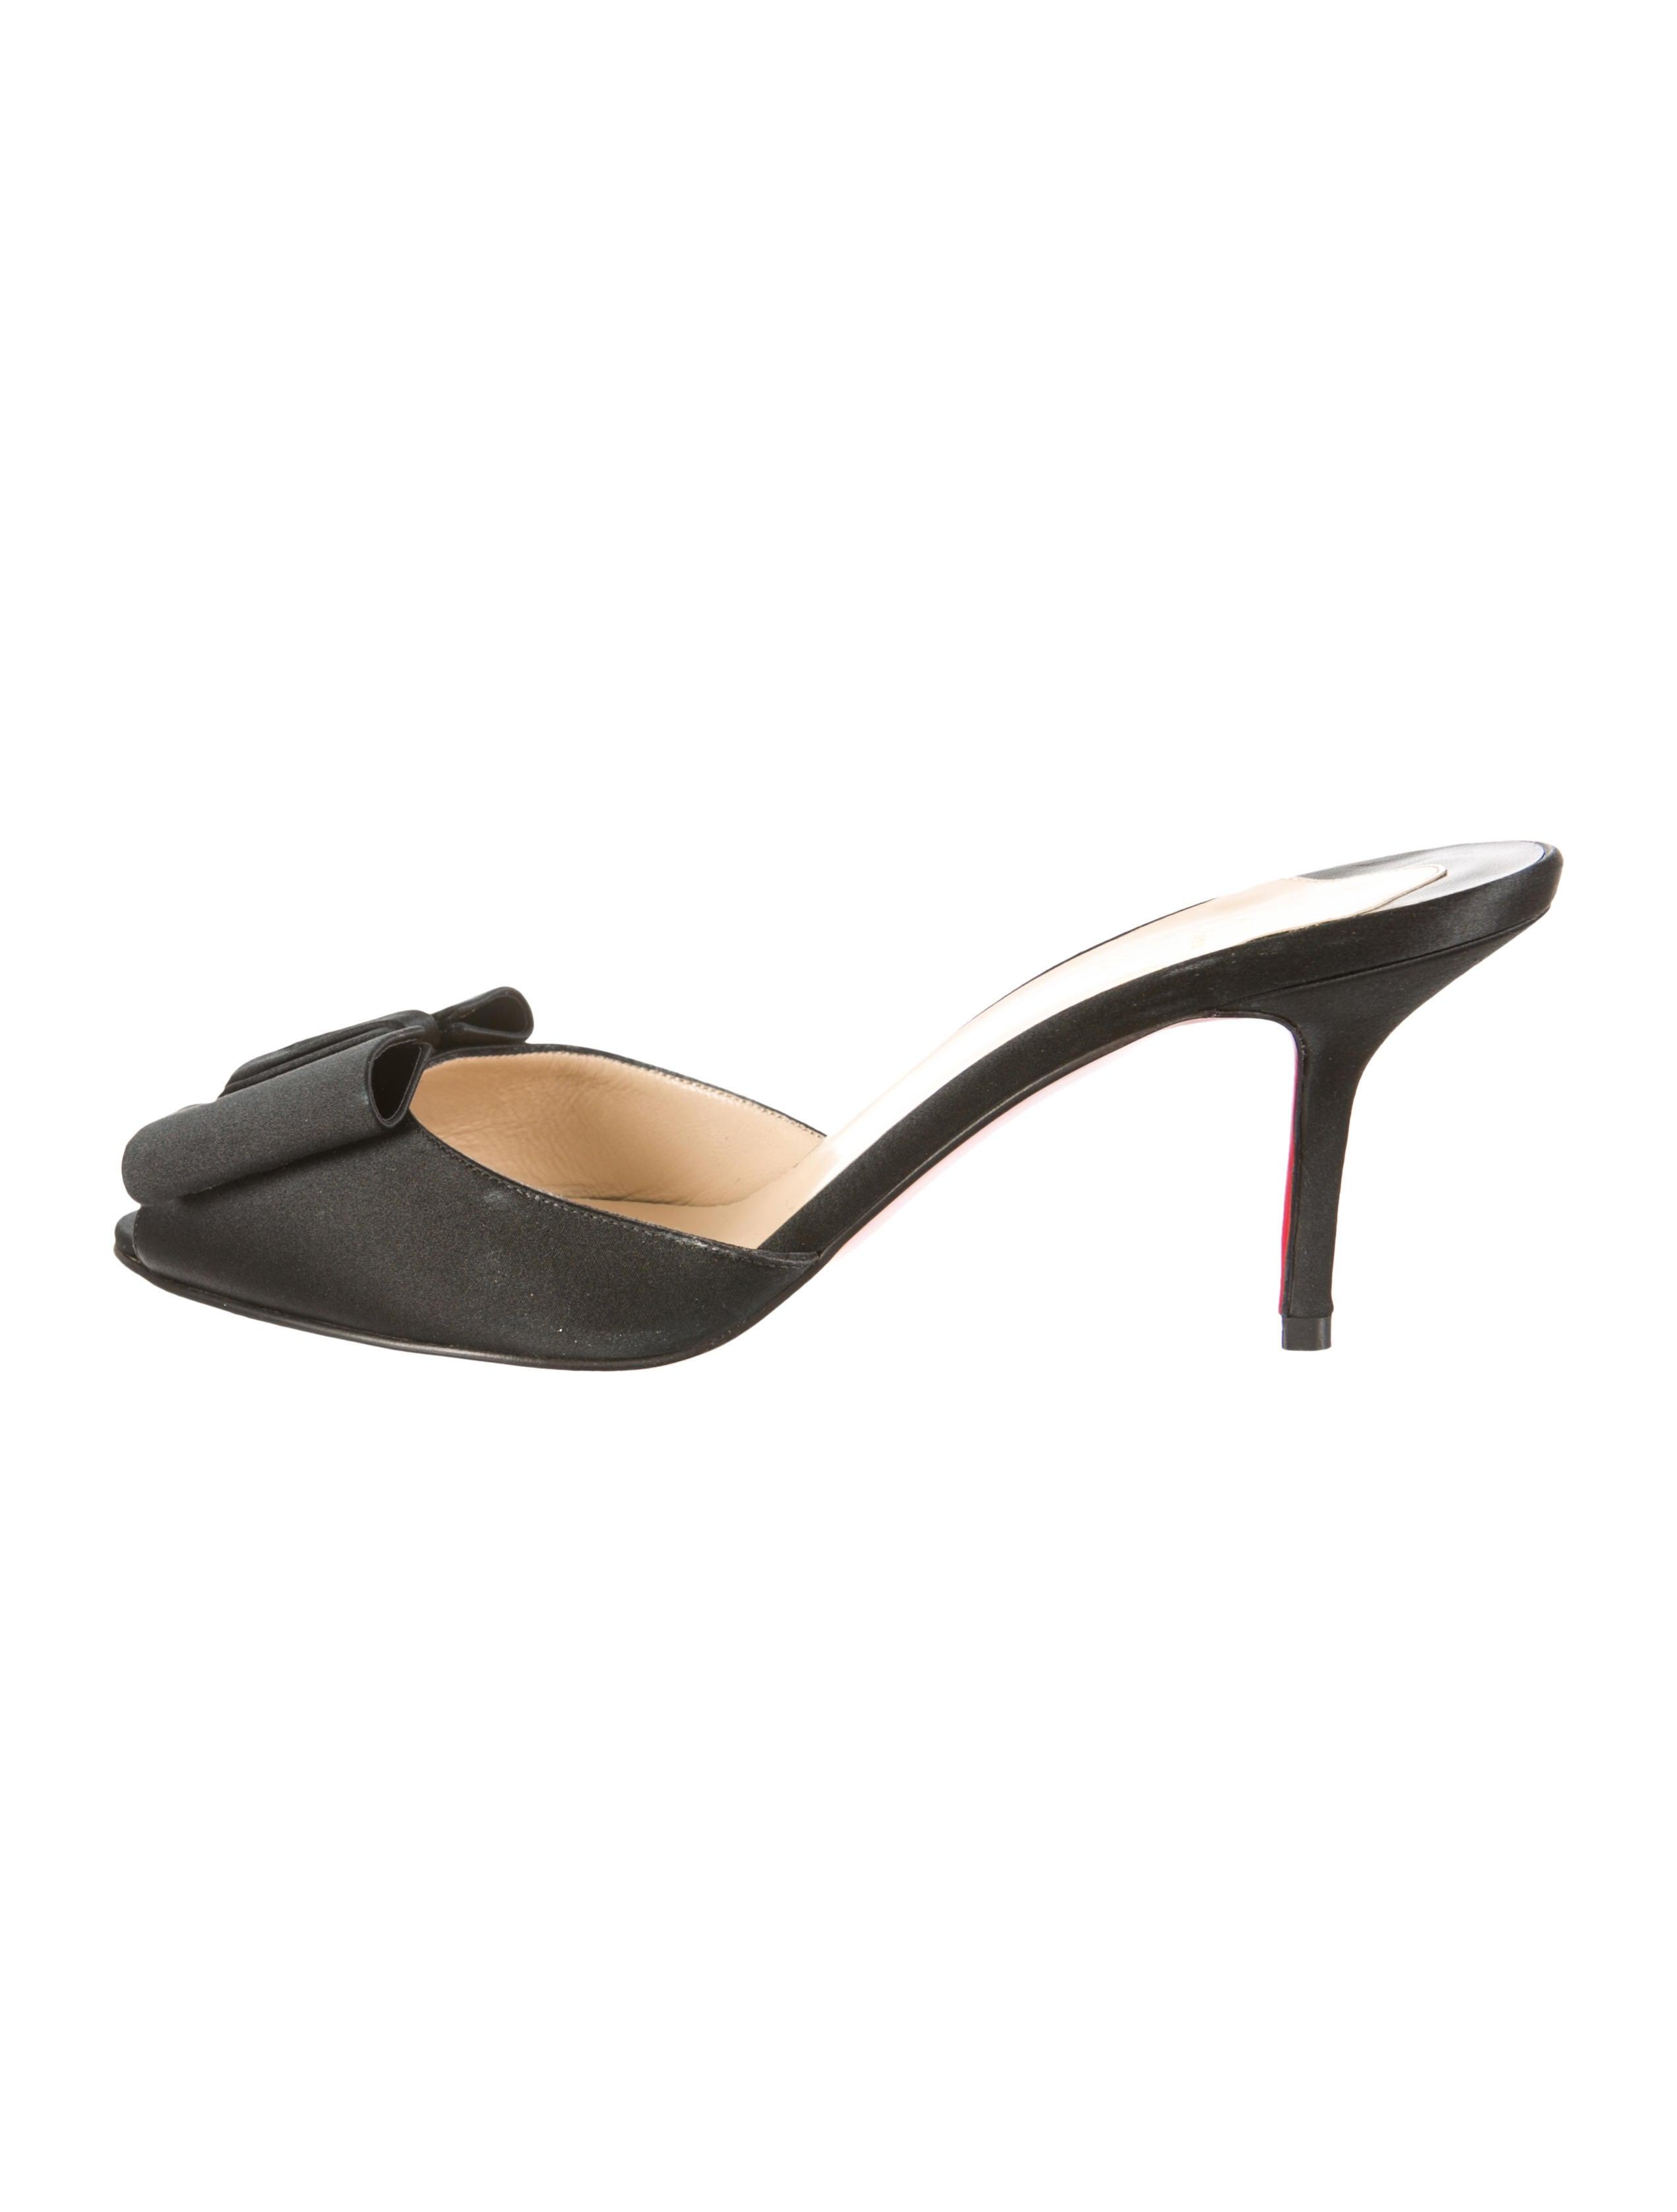 Artesur ? christian louboutin slide sandals